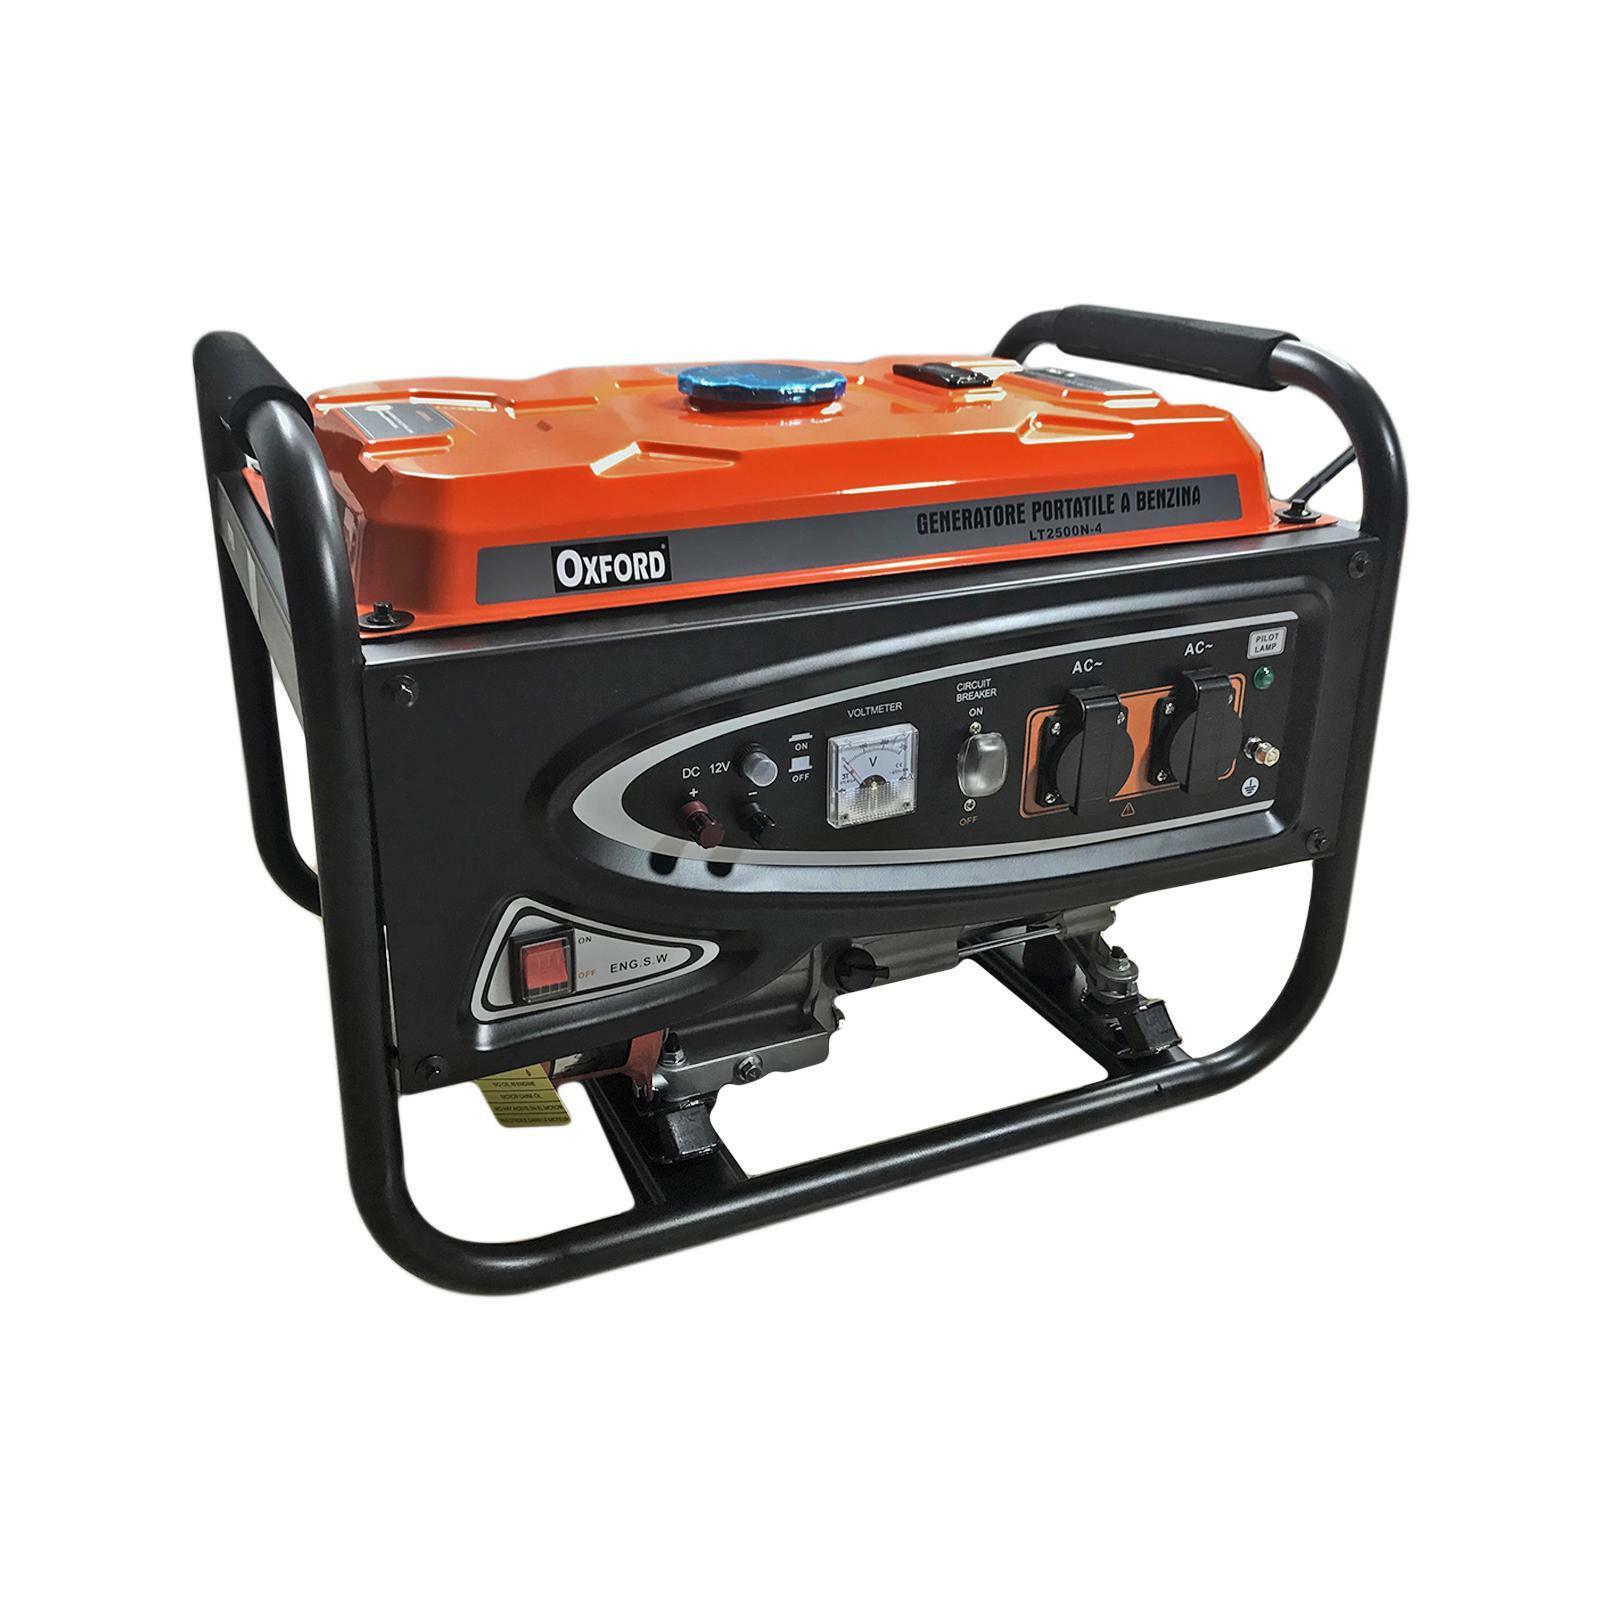 oxford generatore portatile a benzina 2.5 kw